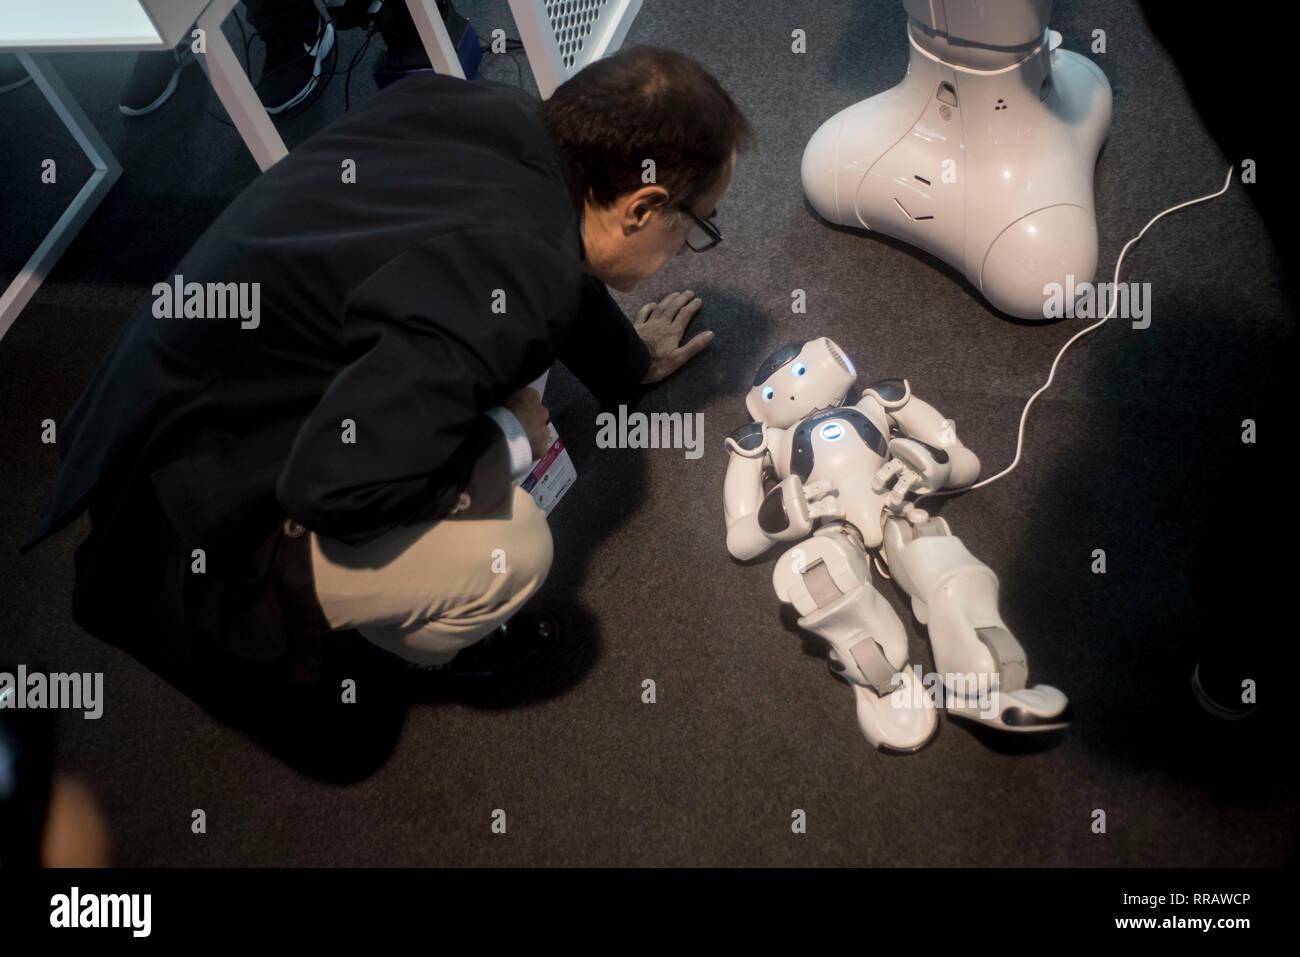 Event Robot Stock Photos & Event Robot Stock Images - Alamy